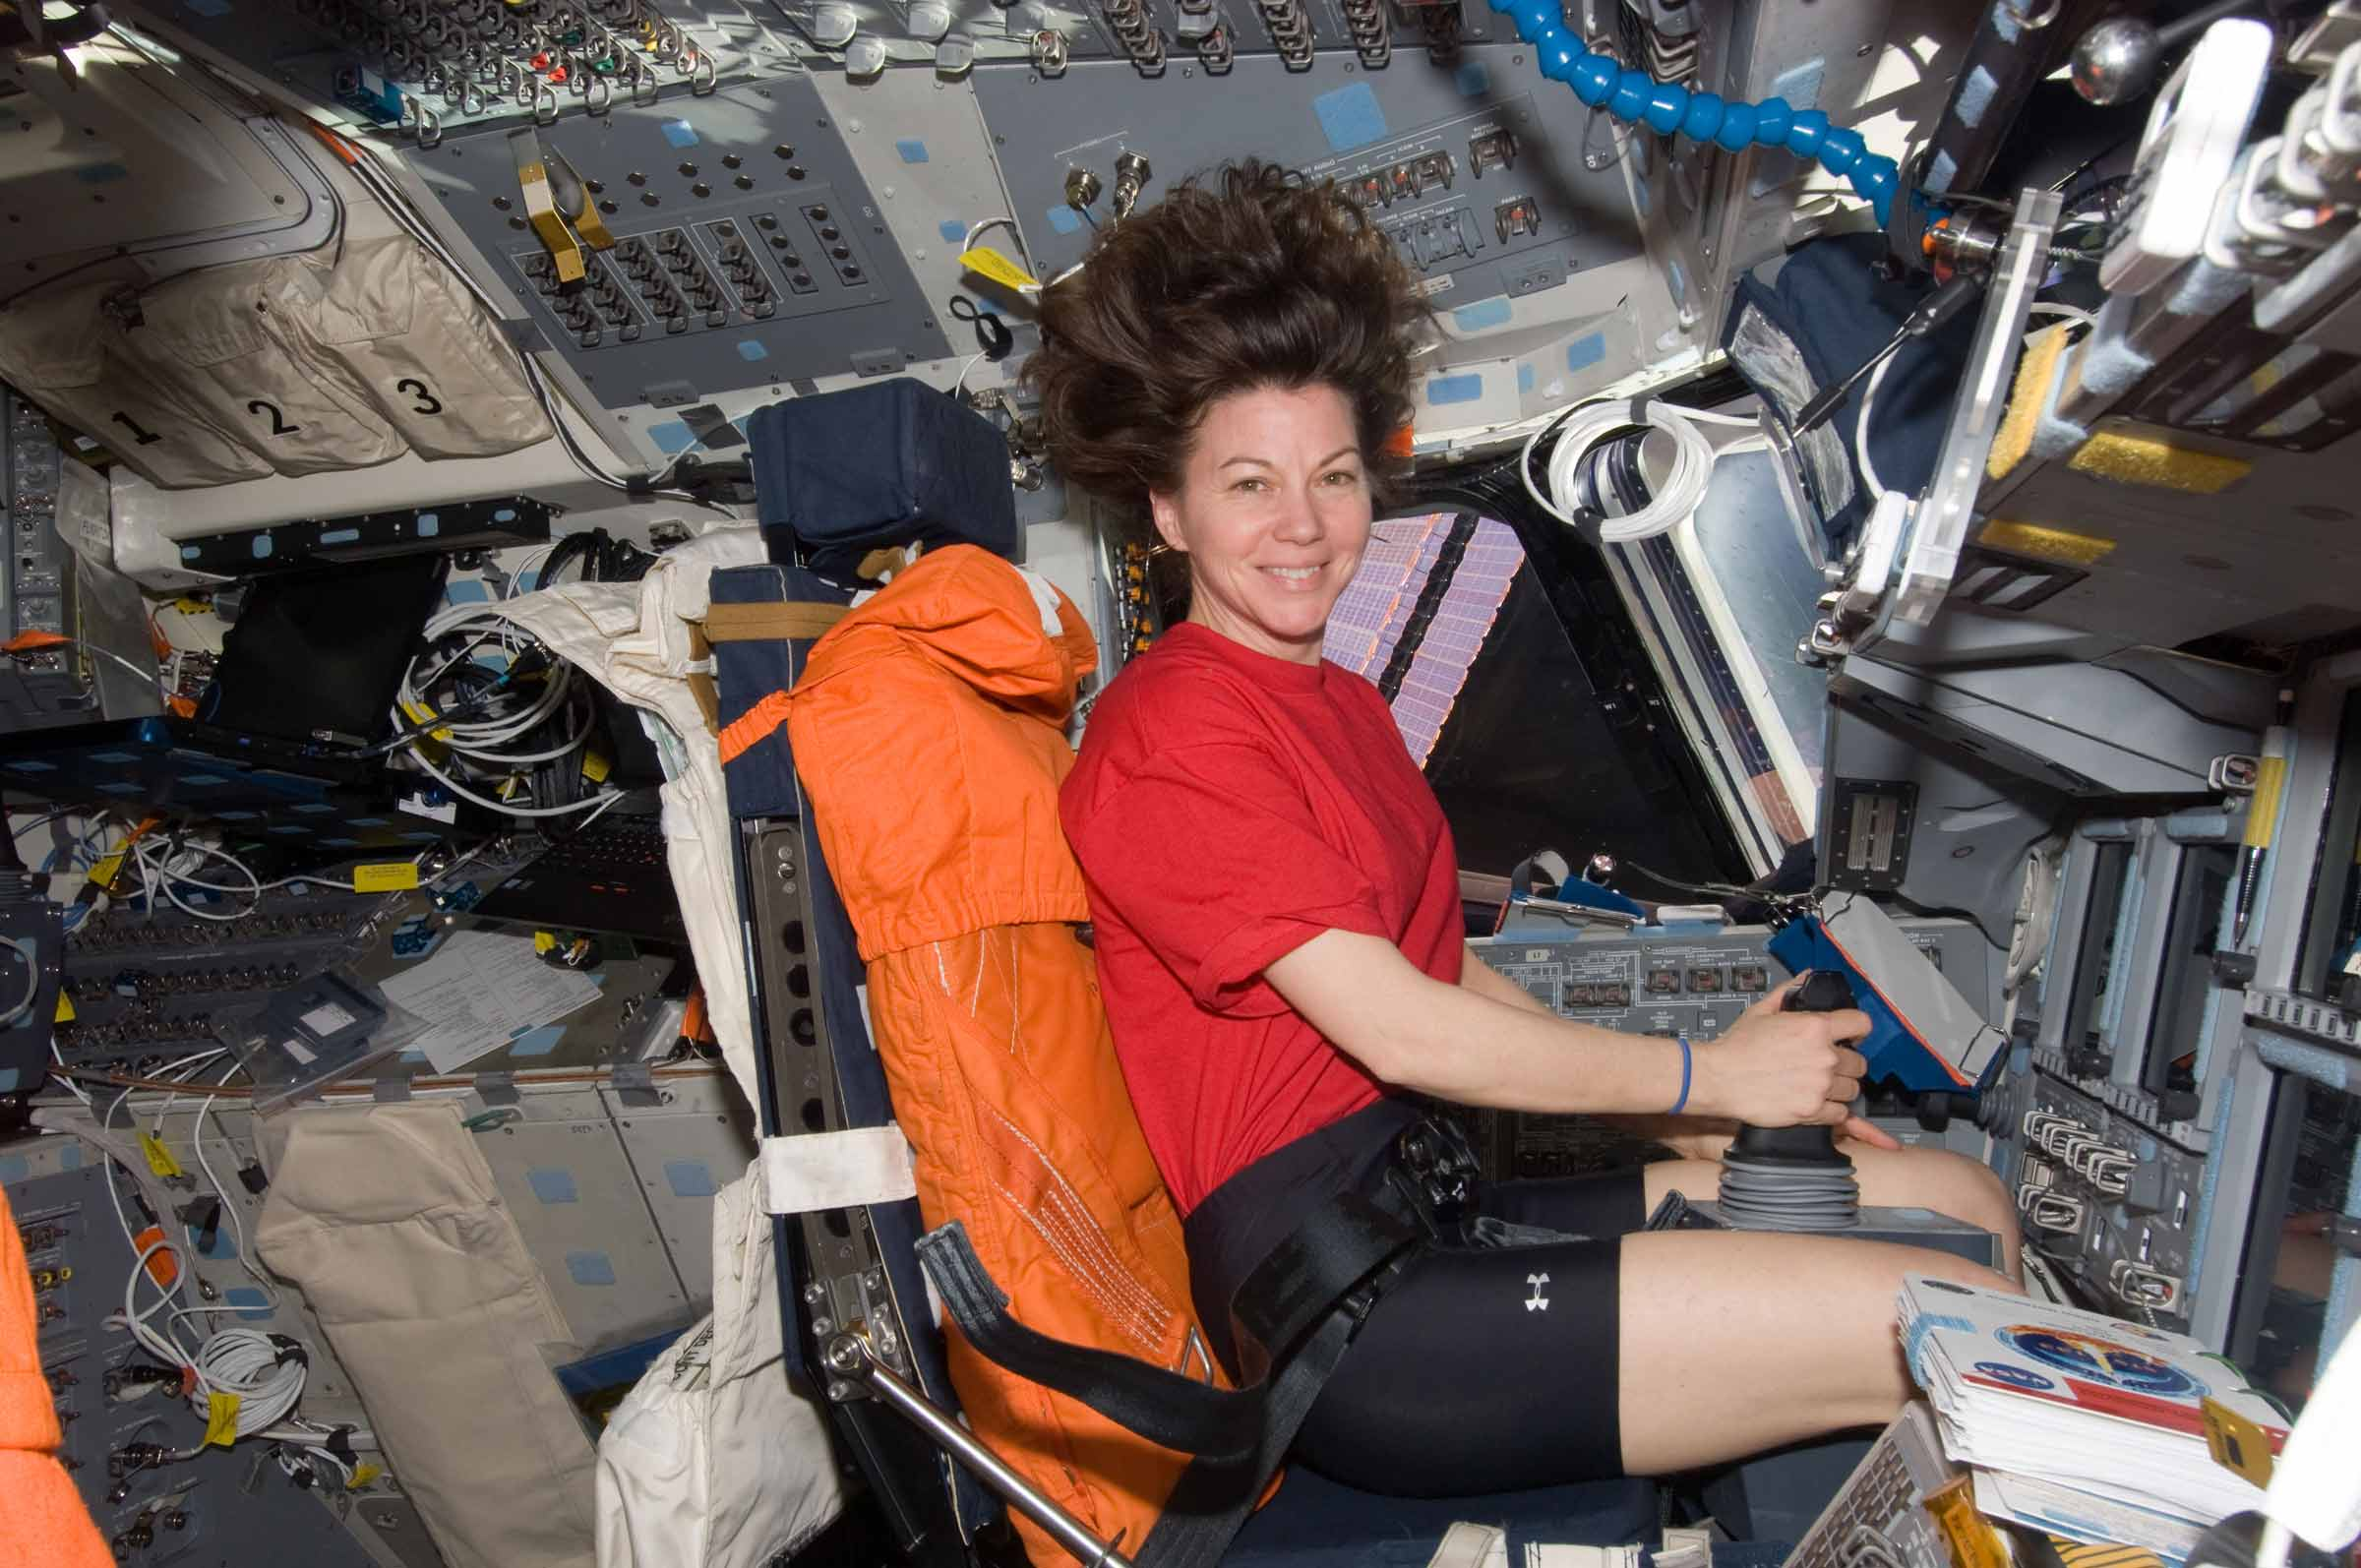 Astronaut Cady Coleman. Photo courtesy of NASA.